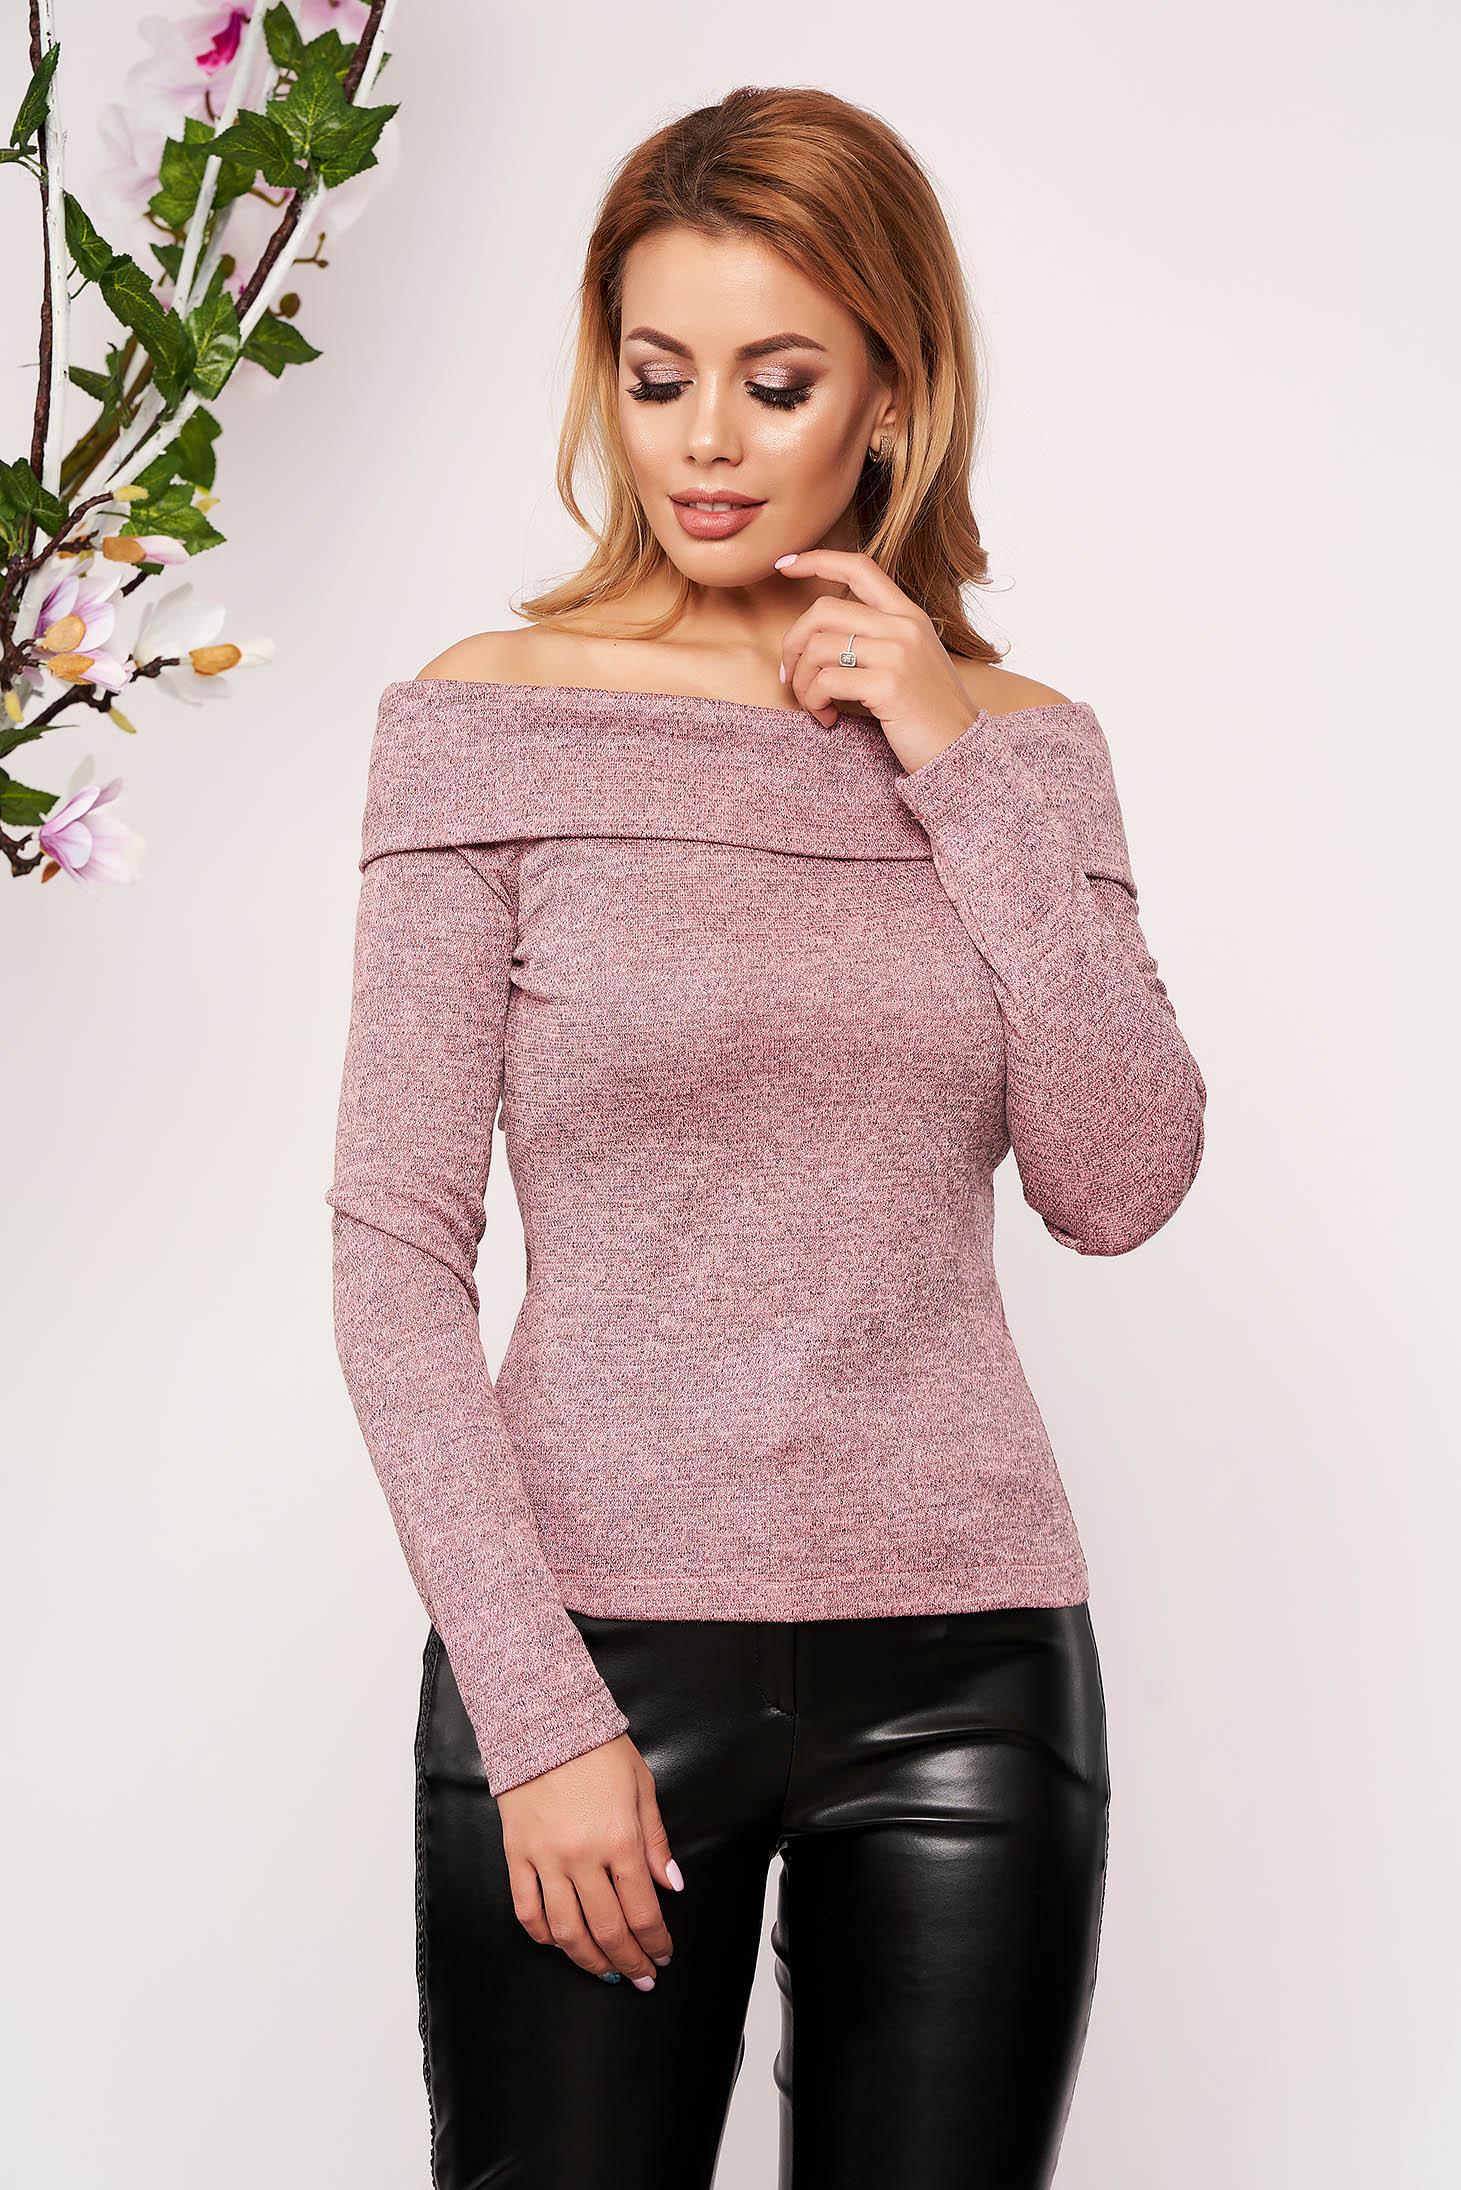 Pulover StarShinerS roz deschis elegant scurt mulat din material tricotat cu maneci lungi si umeri goi